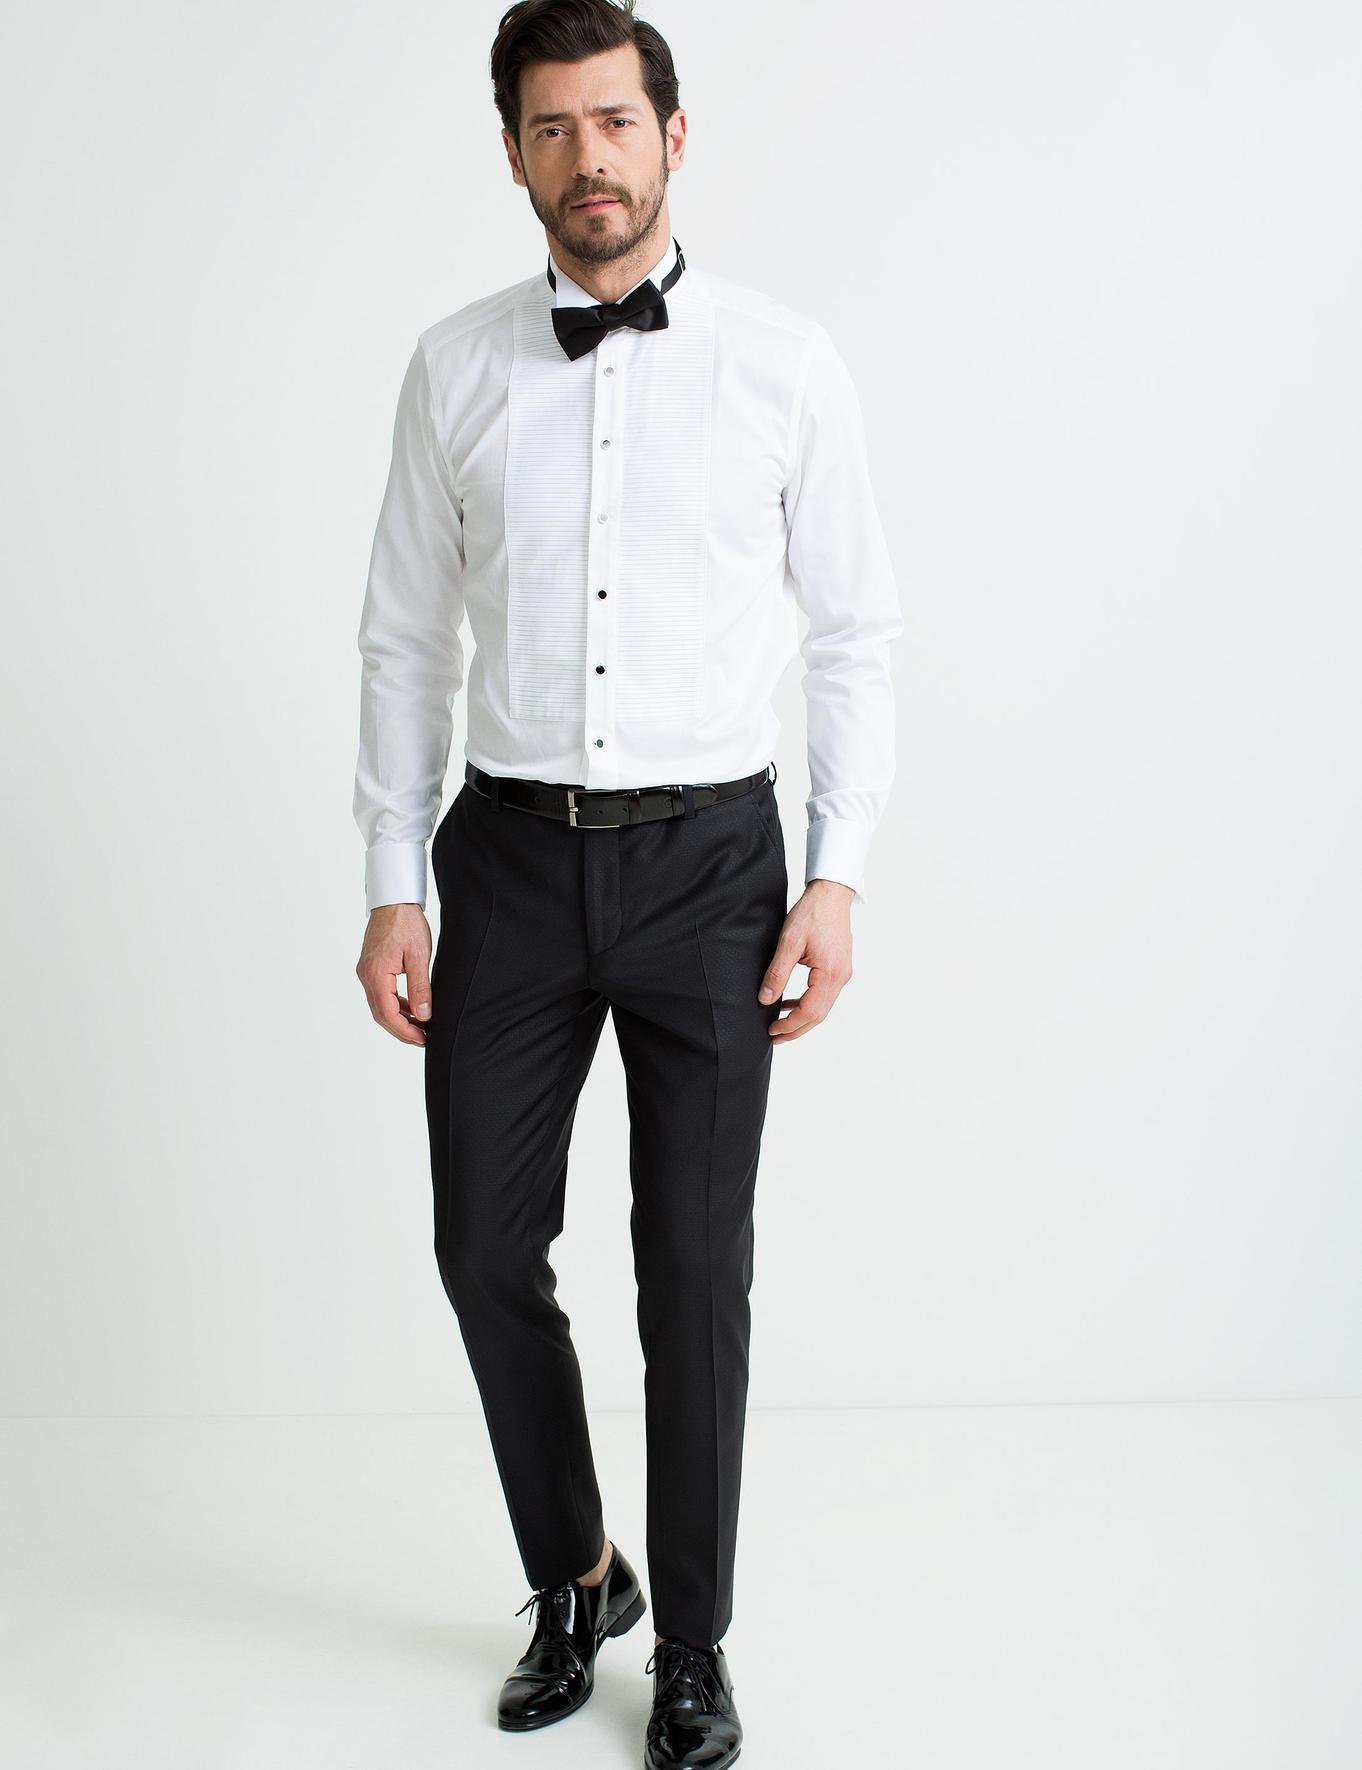 Beyaz Slim Fit Smokin Gömlek